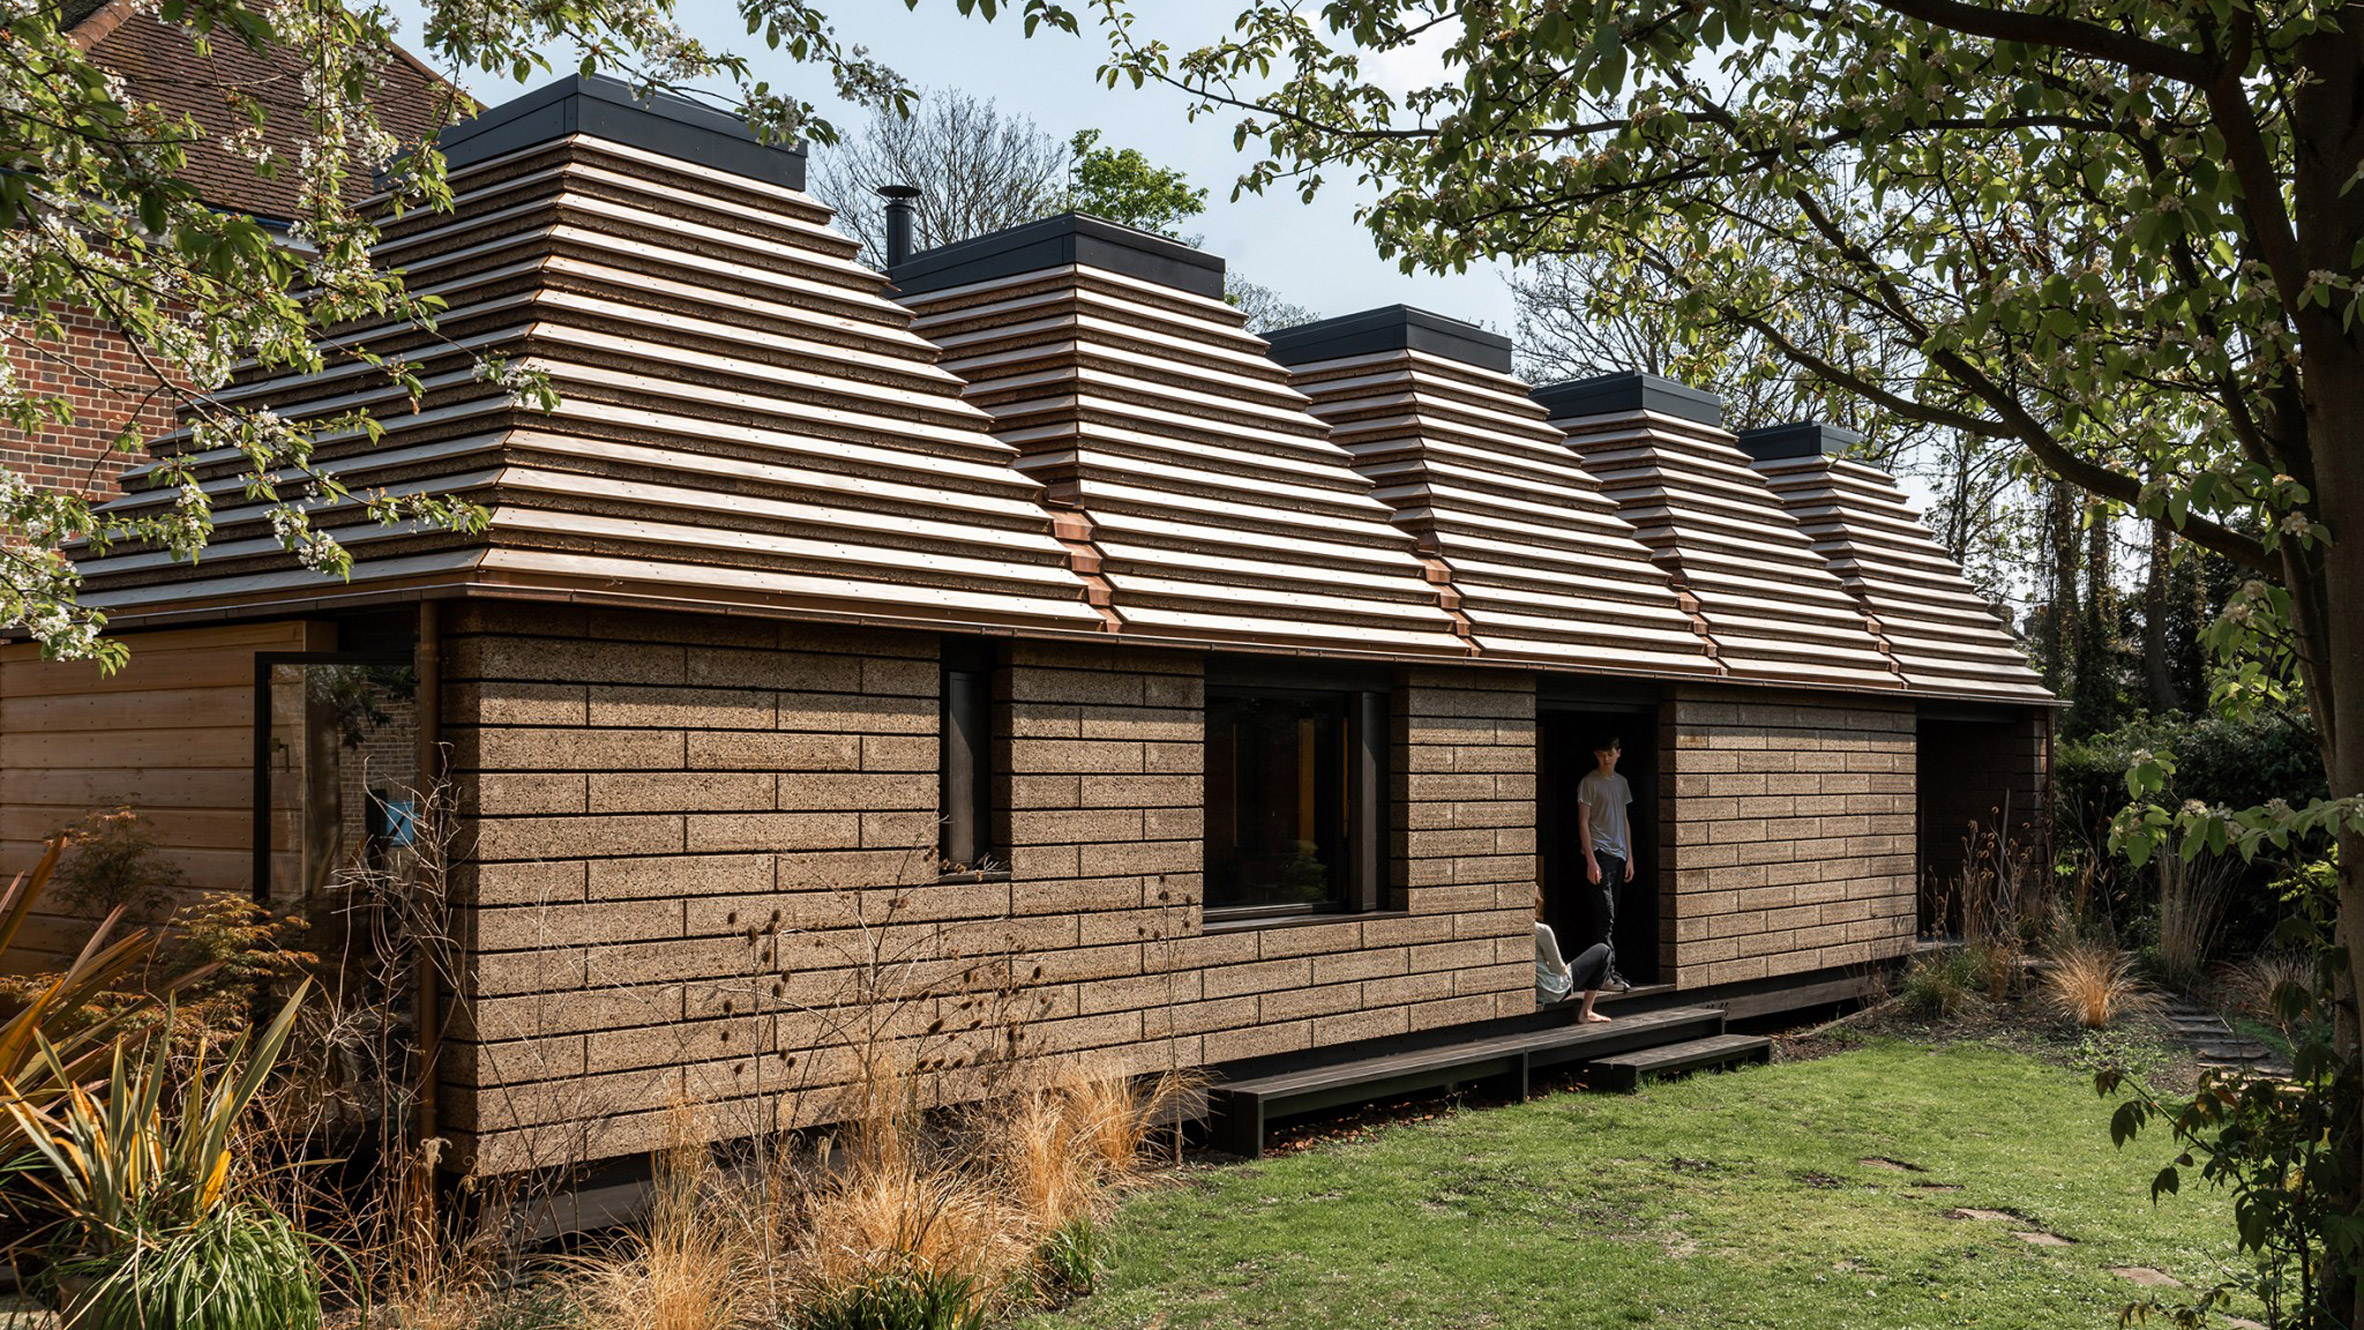 Cork House, Windsor, UK, byMatthew Barnett Howland with Dido MilneandOliver Wilton